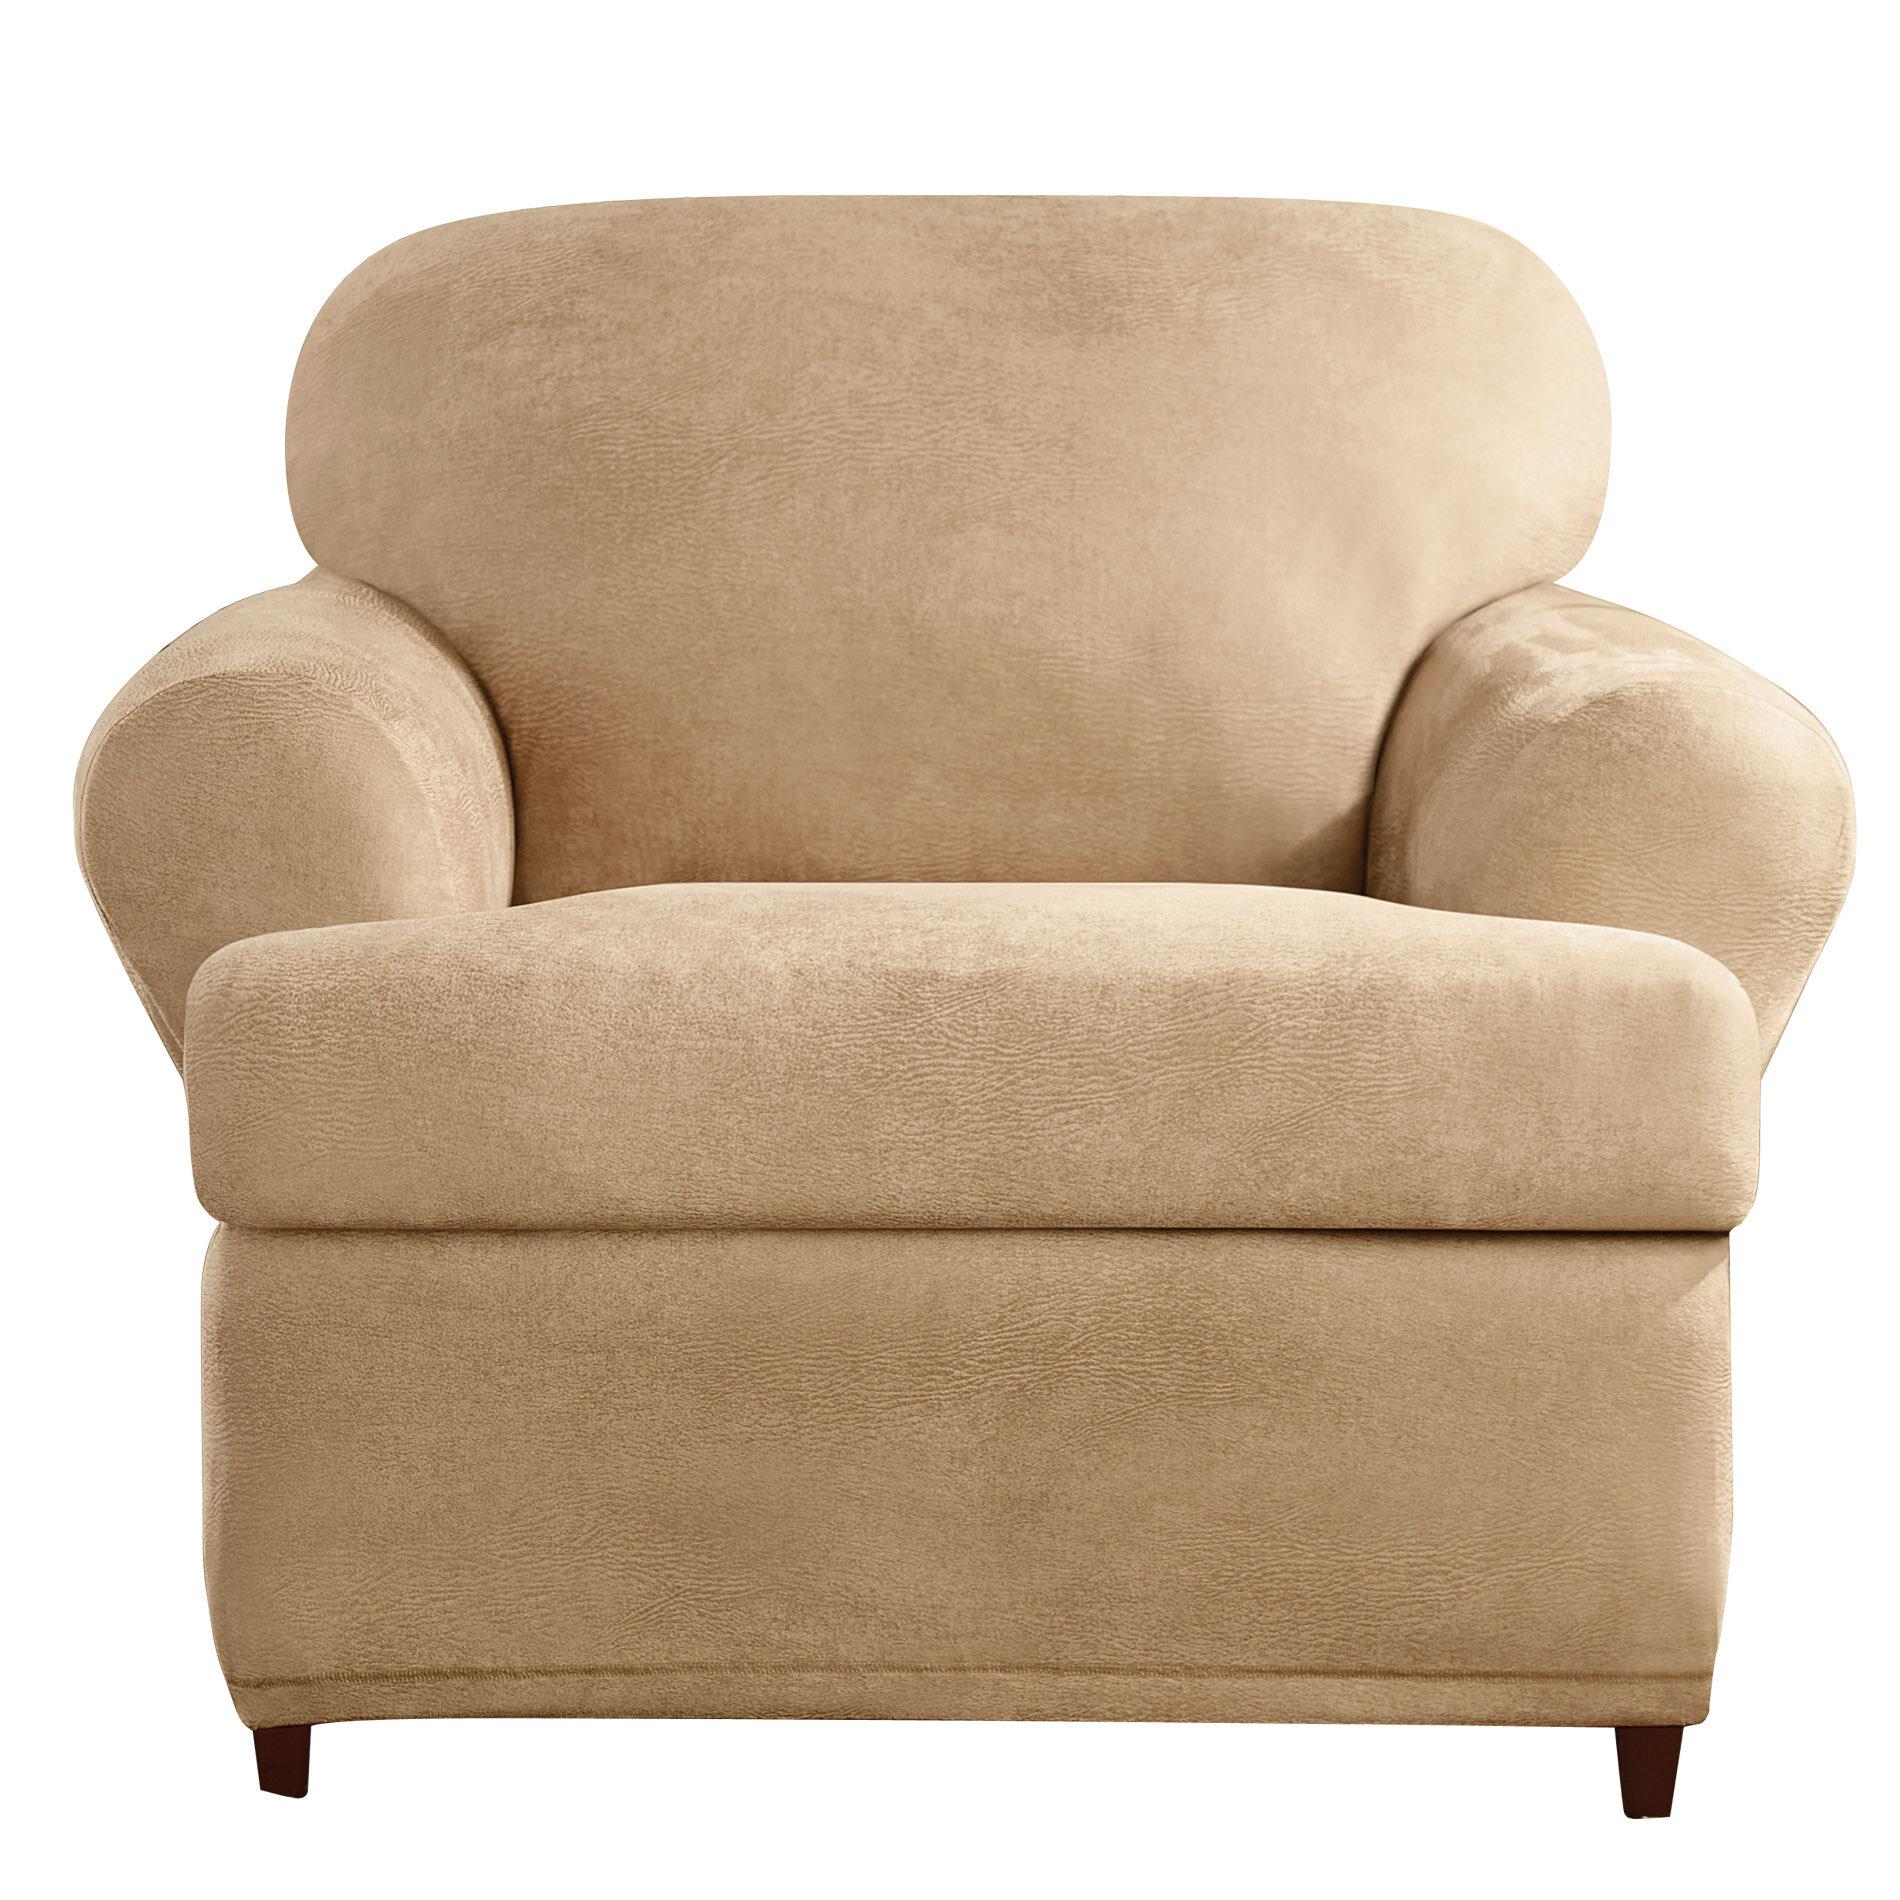 Sure fit t cushion armchair slipcover reviews wayfair